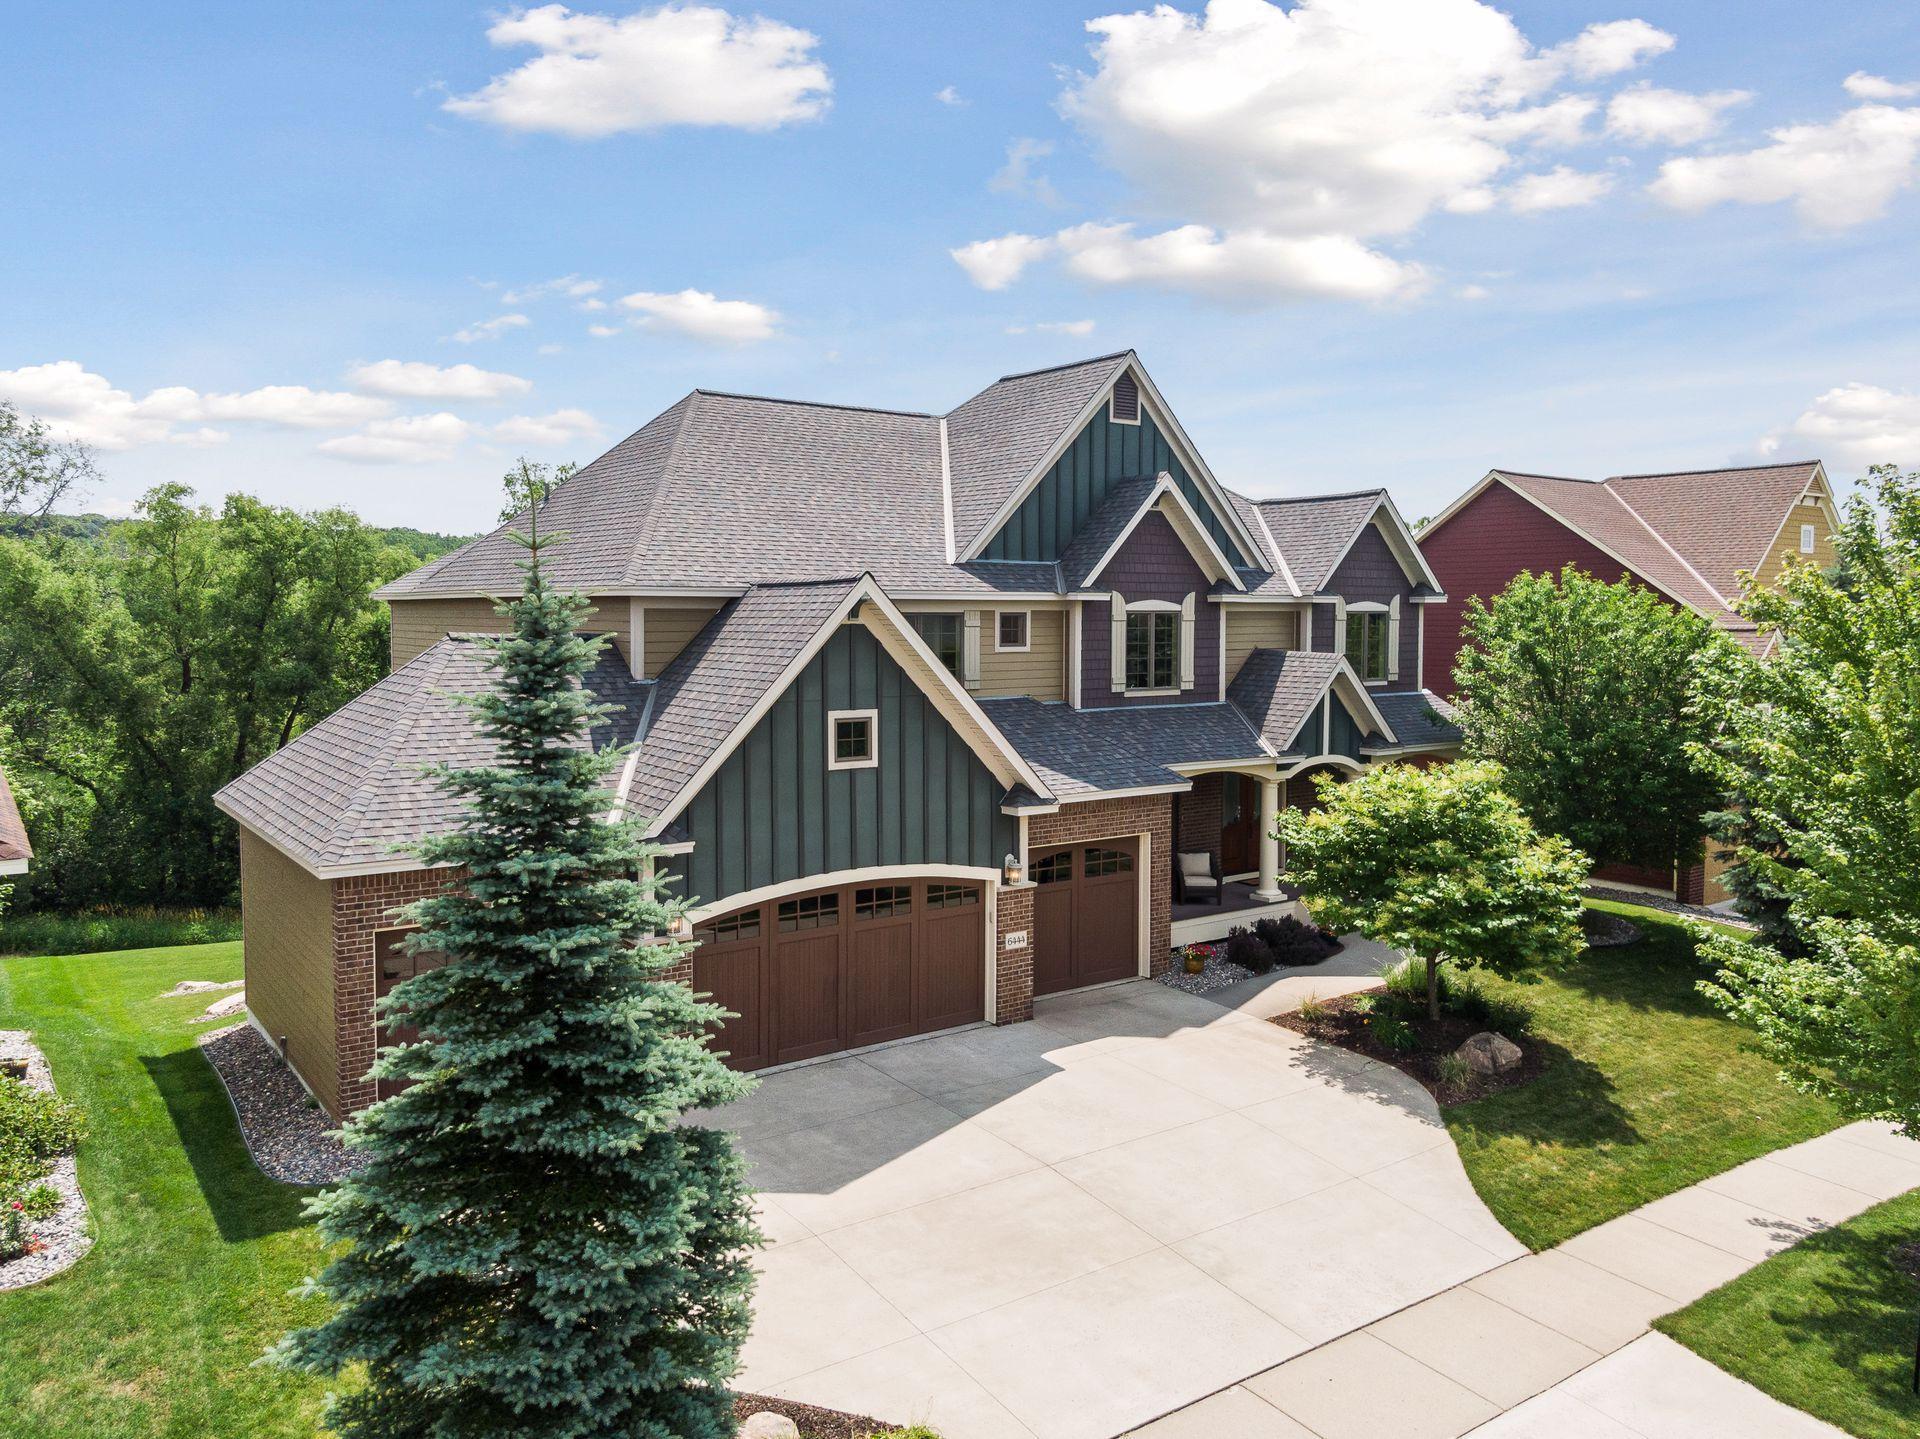 6444 Garland Lane N Property Photo - Maple Grove, MN real estate listing